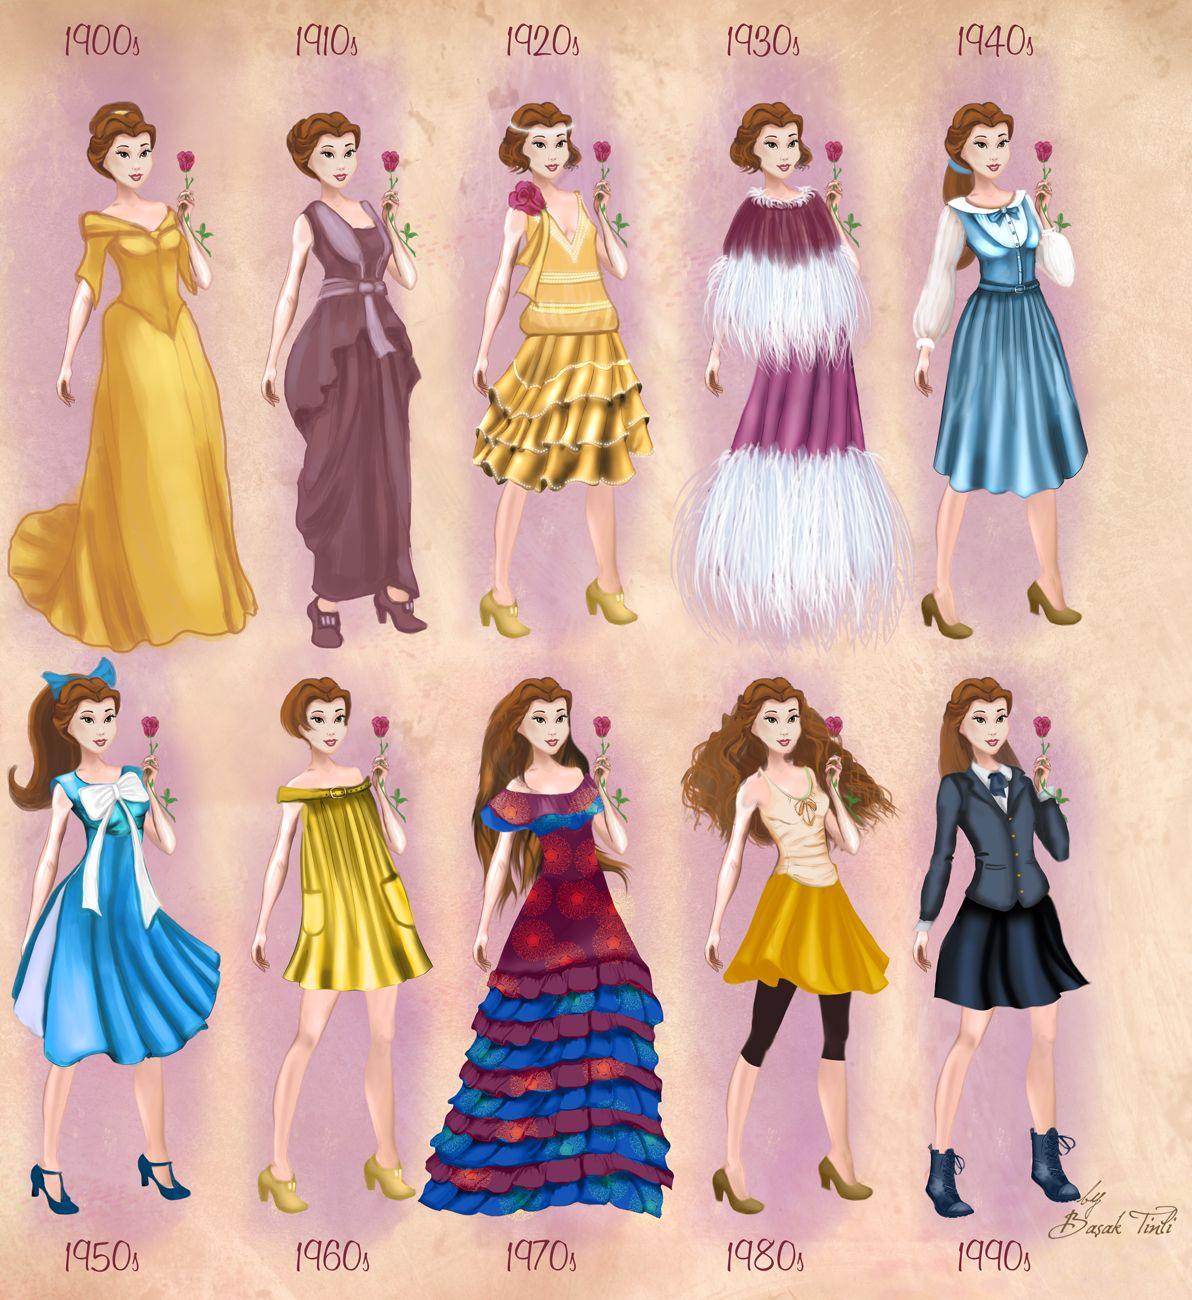 Belle in in 20th century fashion by BasakTinli by BasakTinli.deviantart.com on @DeviantArt